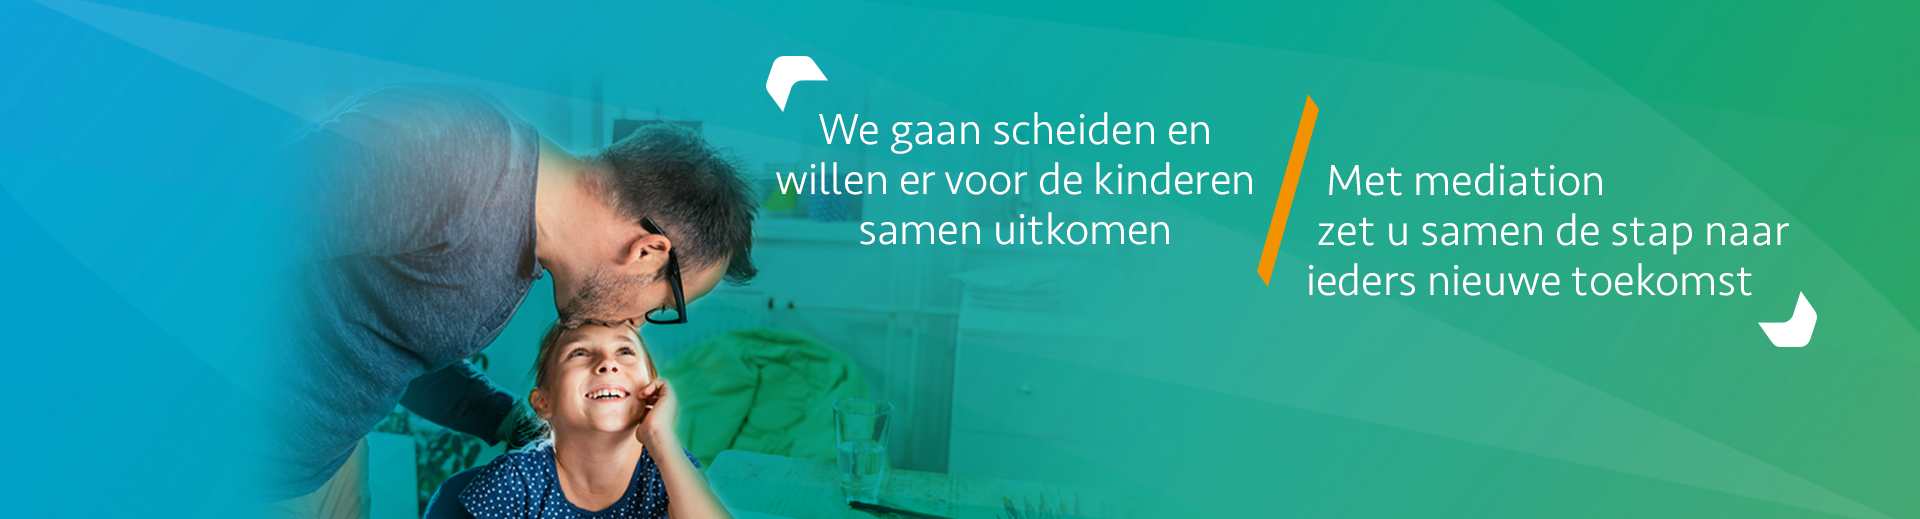 Mediation - Scheidingsplanner Midden-Nederland